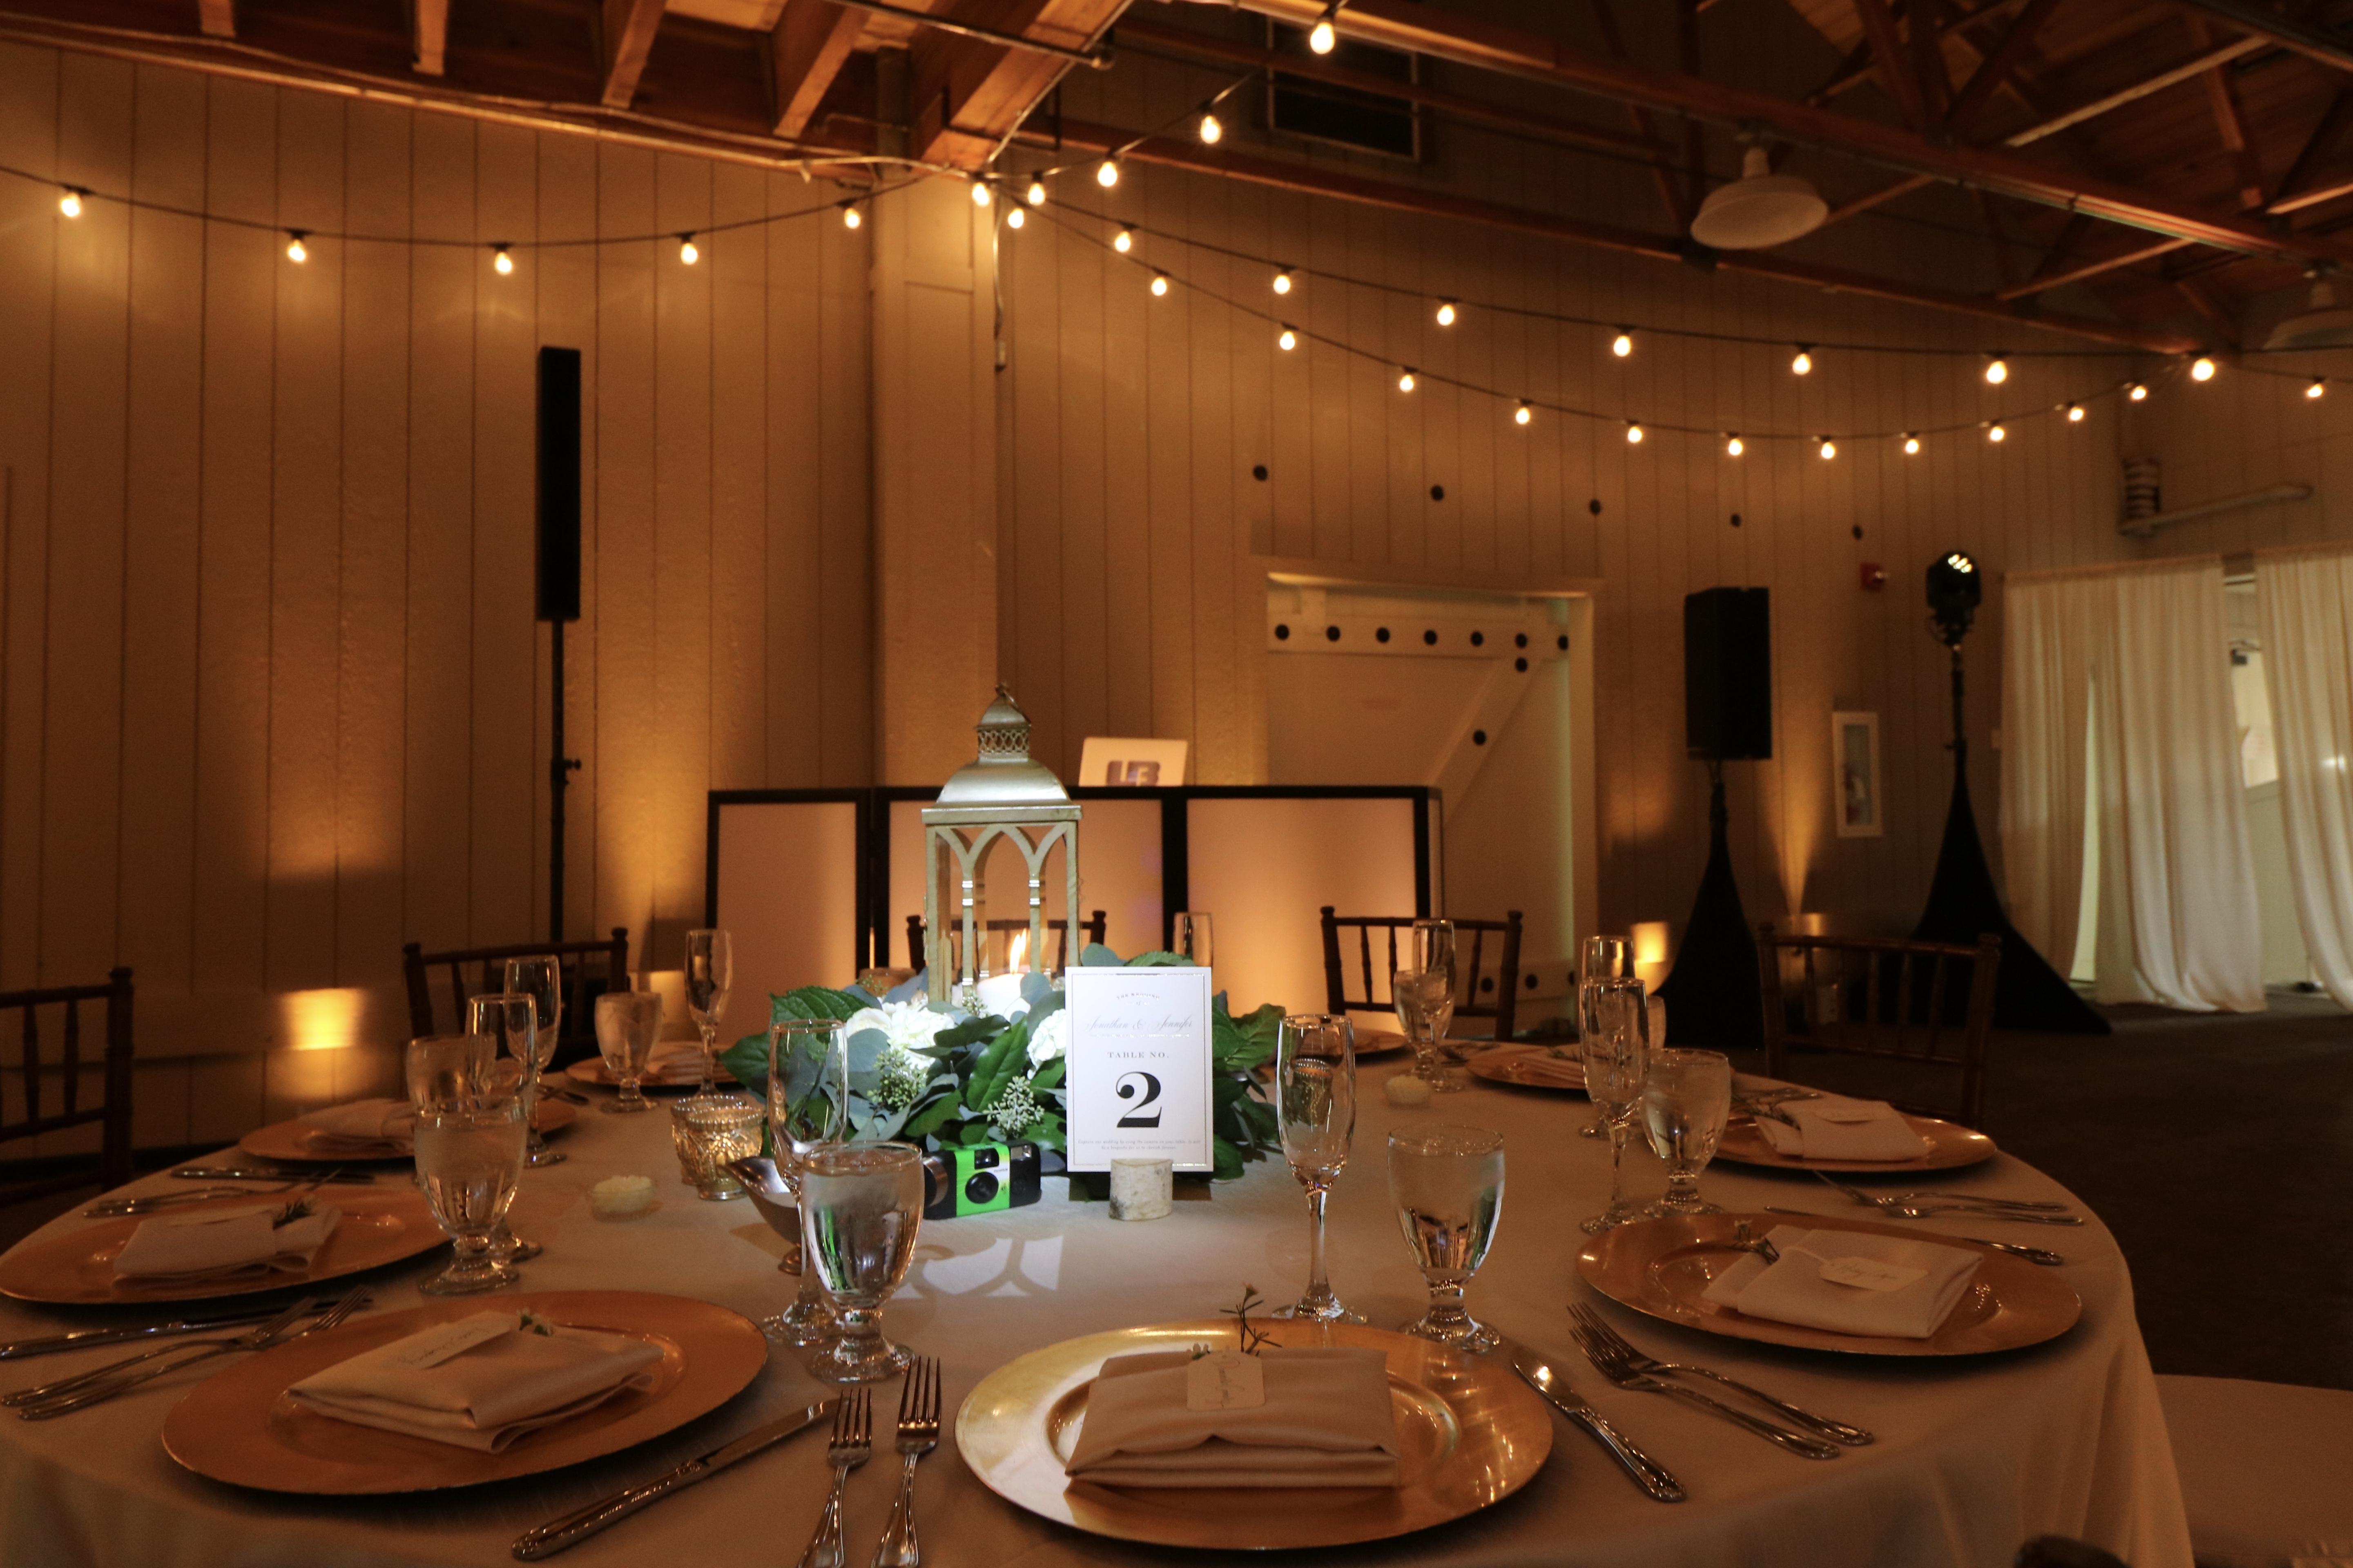 Table pinspot lighting